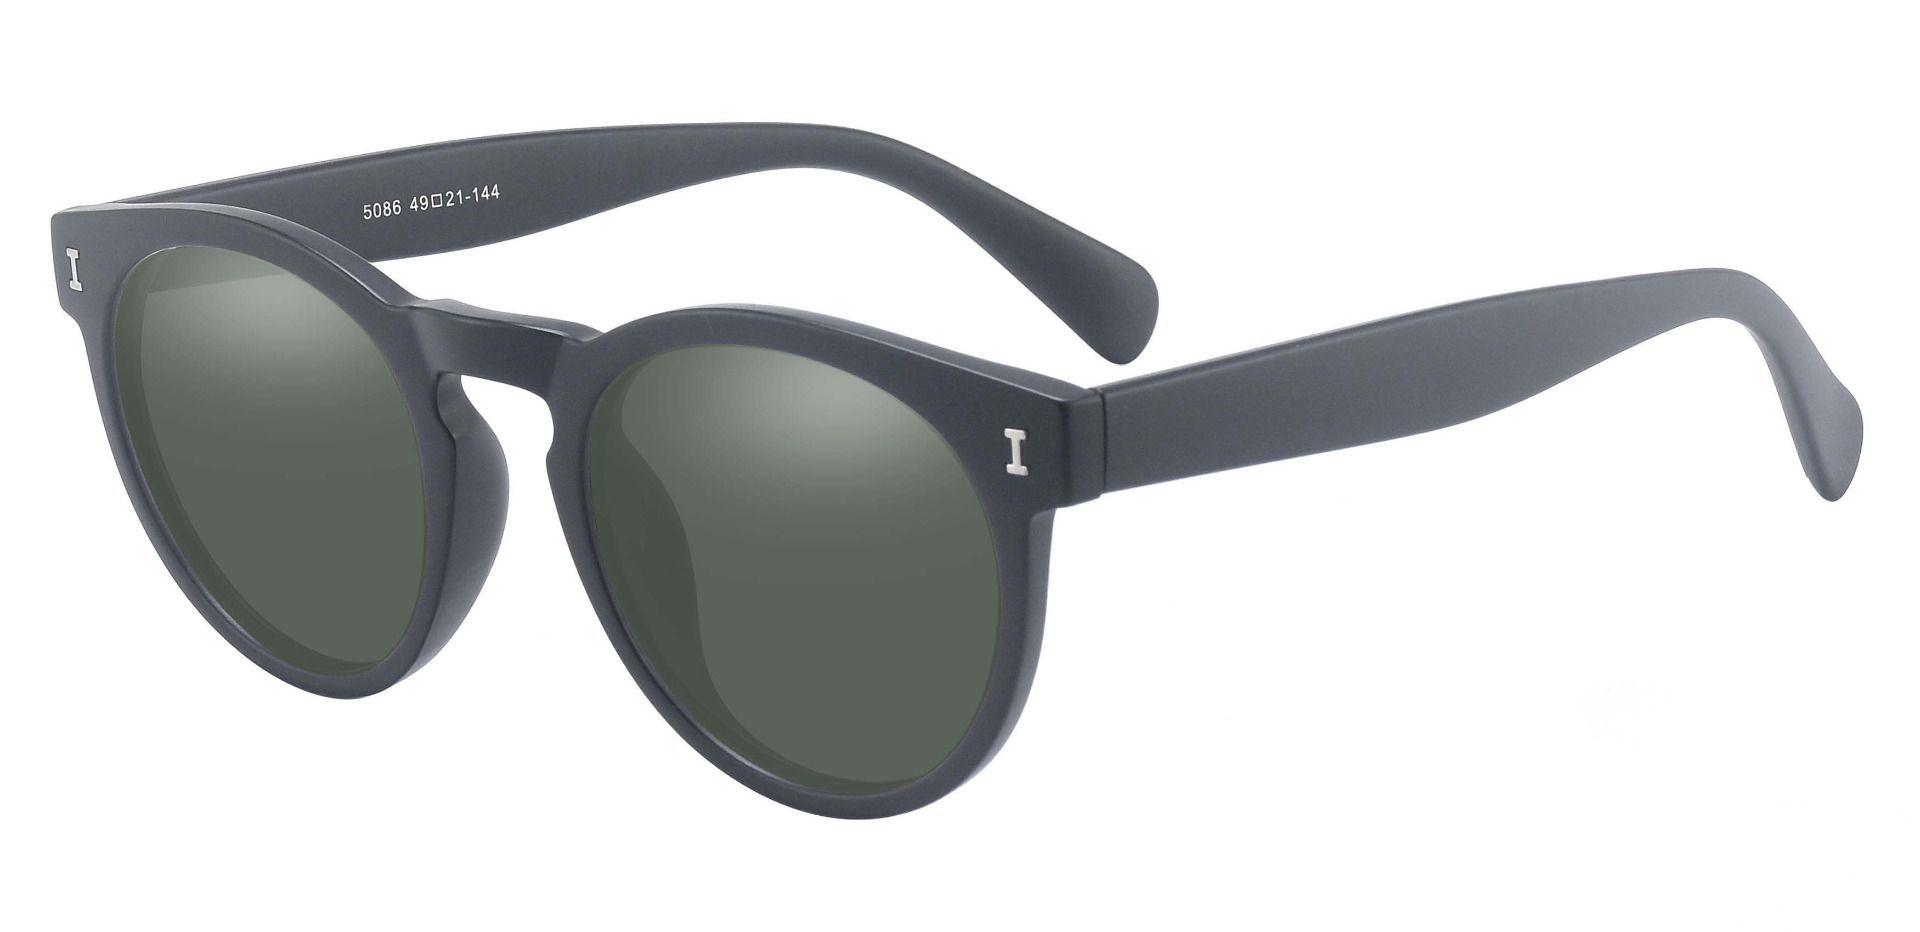 Ozark Round Prescription Sunglasses - Black Frame With Green Lenses